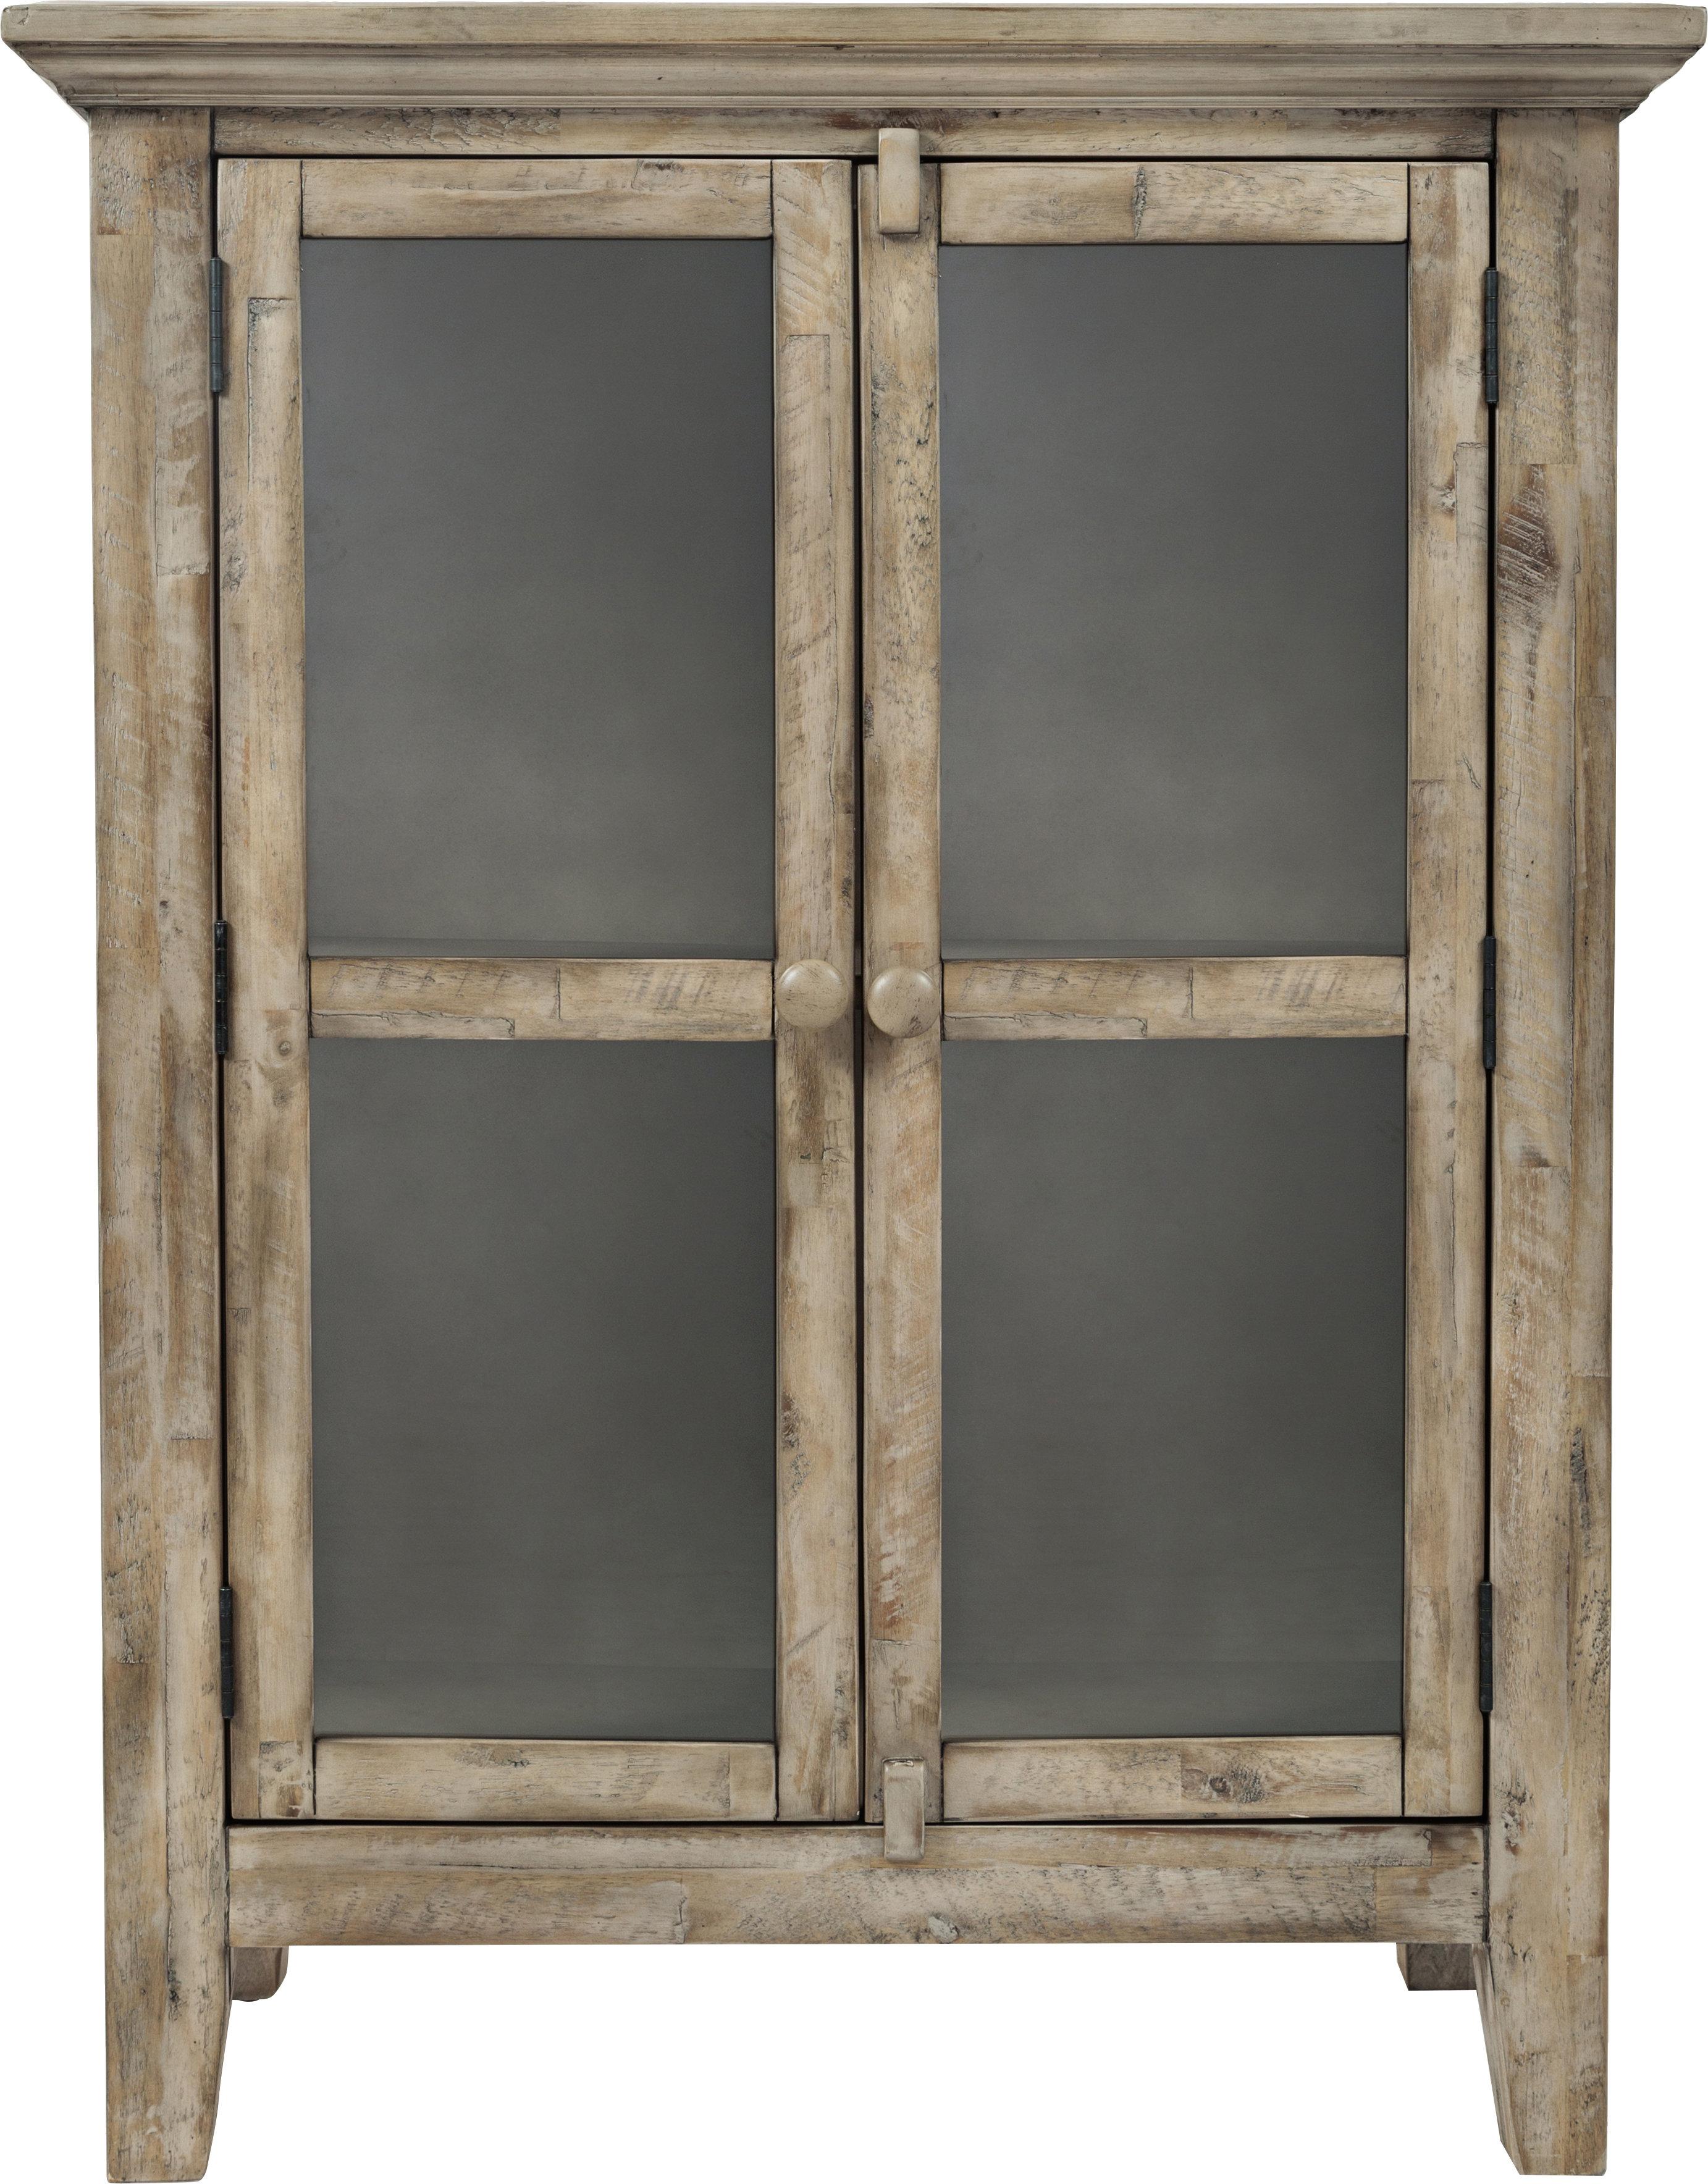 Eau Claire 2 Door Accent Cabinet Throughout Newest Eau Claire 6 Door Accent Cabinets (#6 of 20)